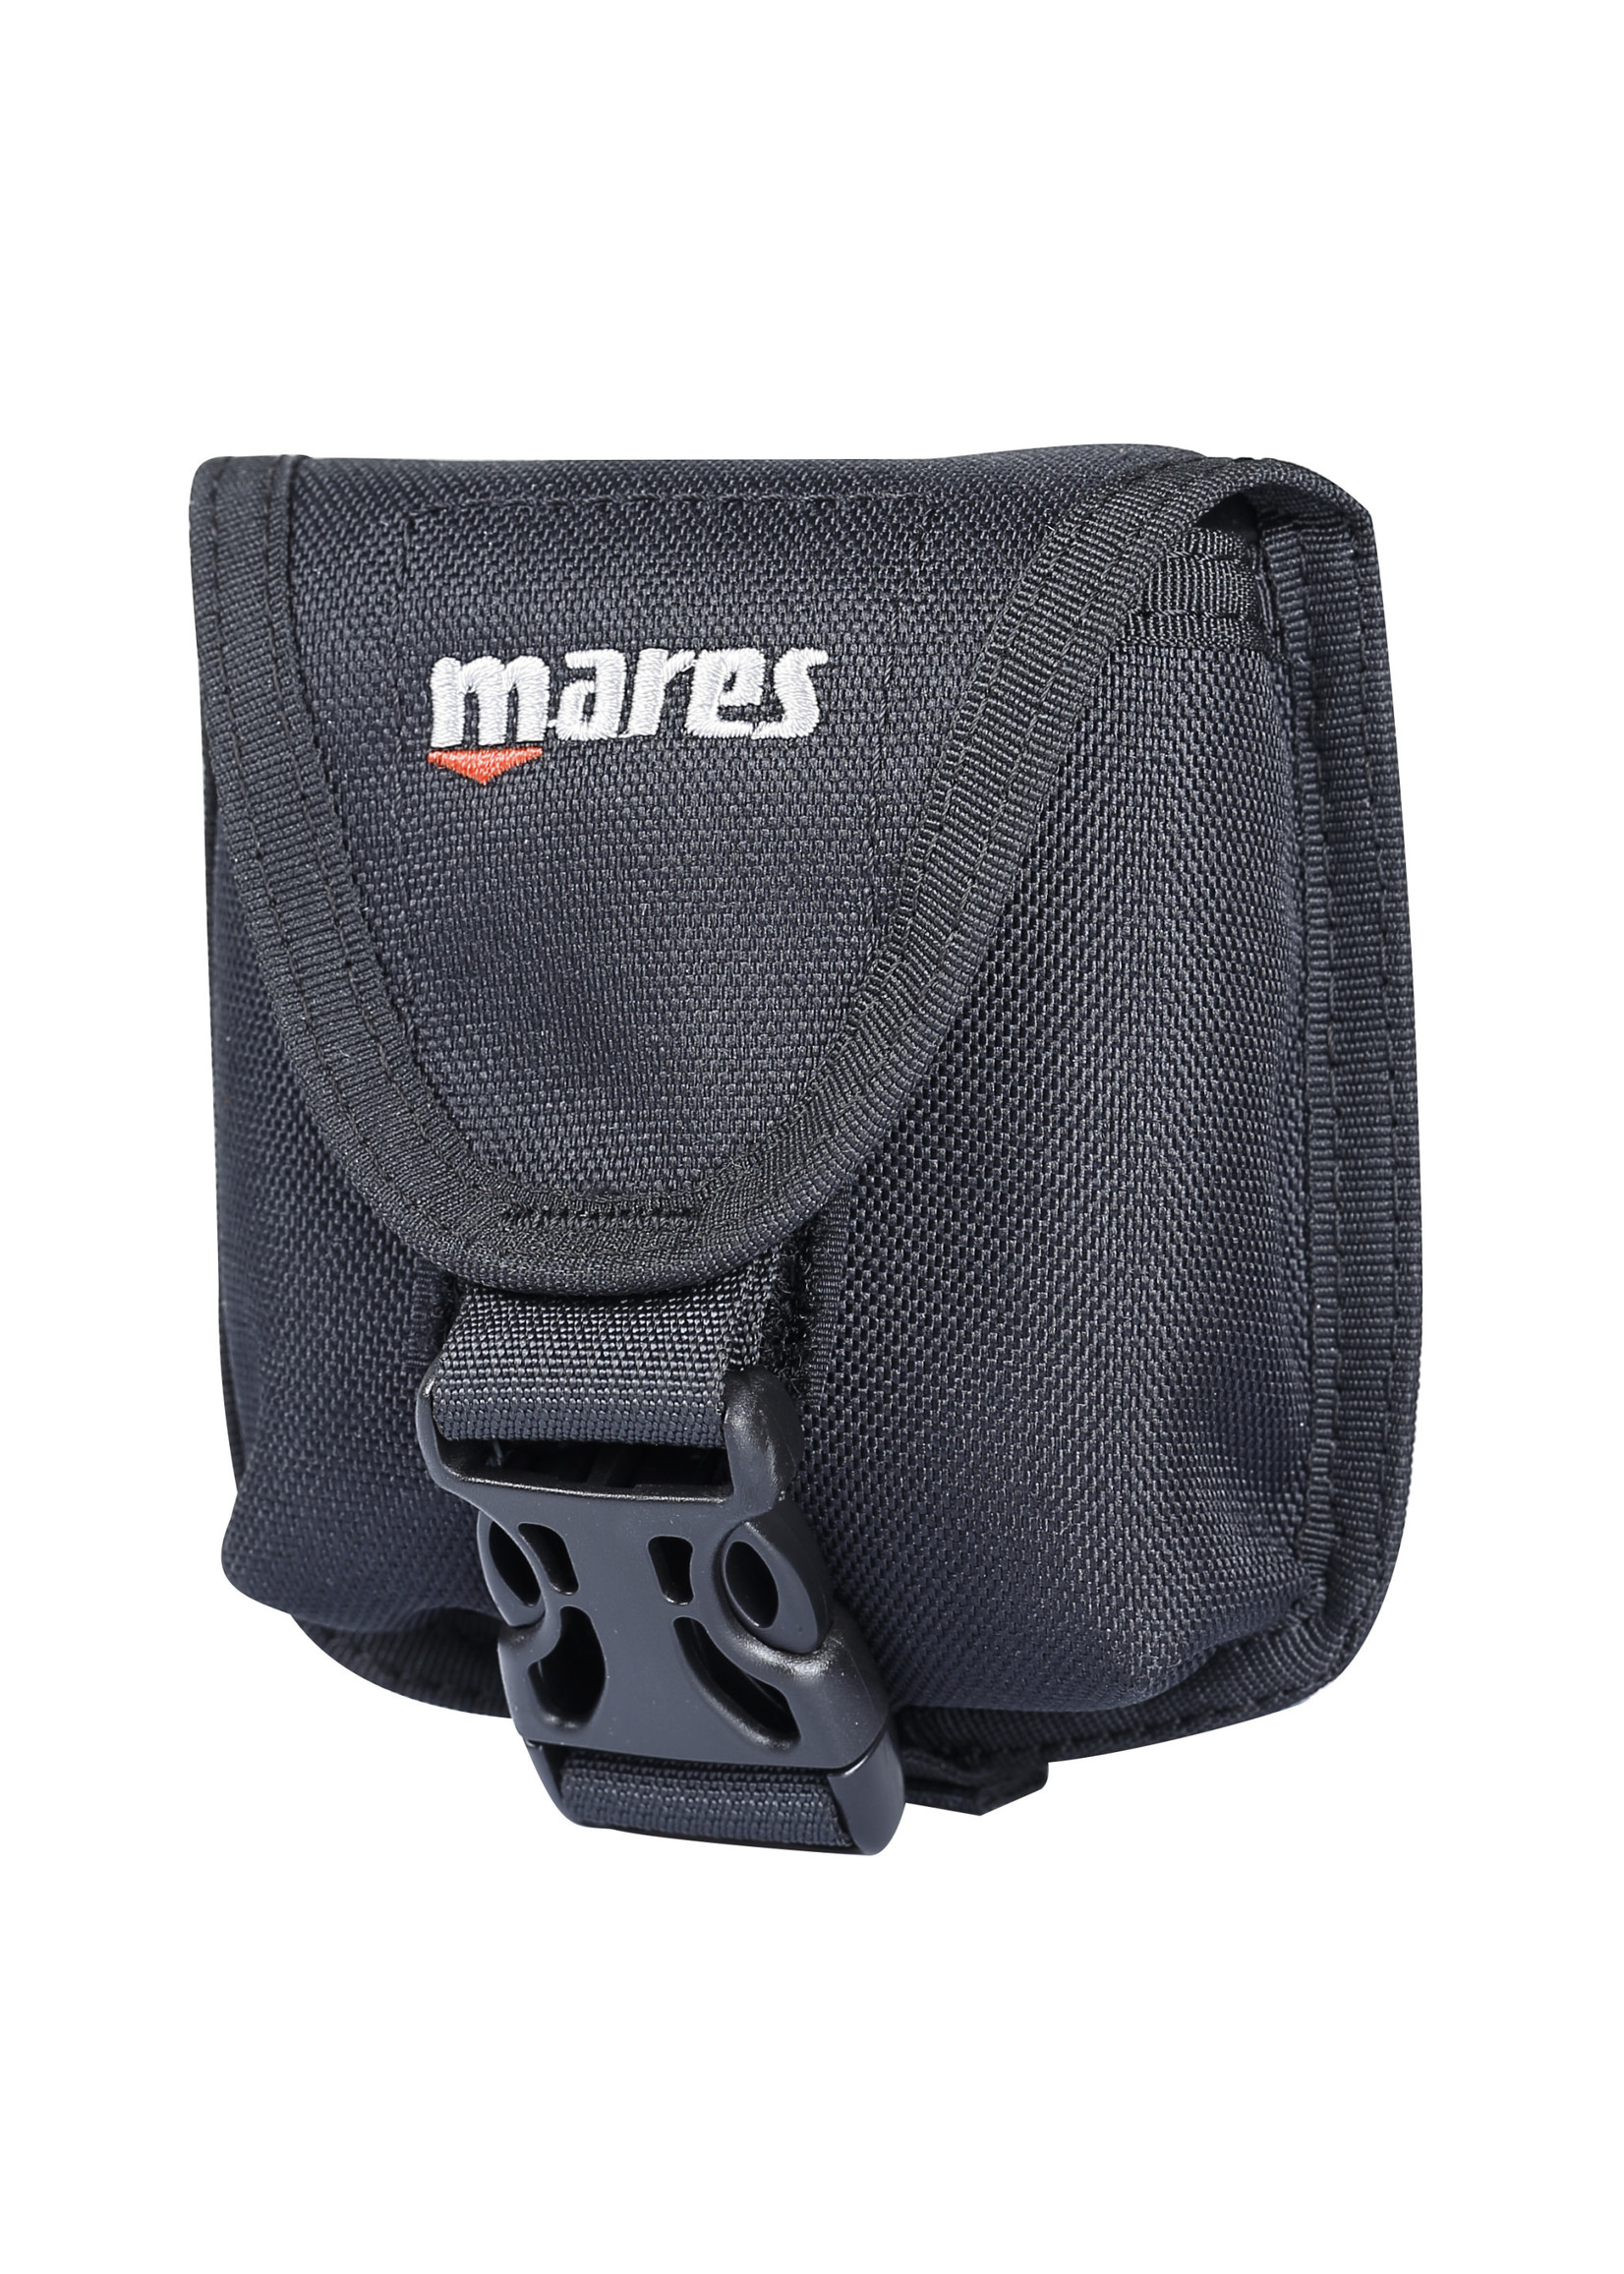 Mares Mares Trim Weight Pockets 2stuks